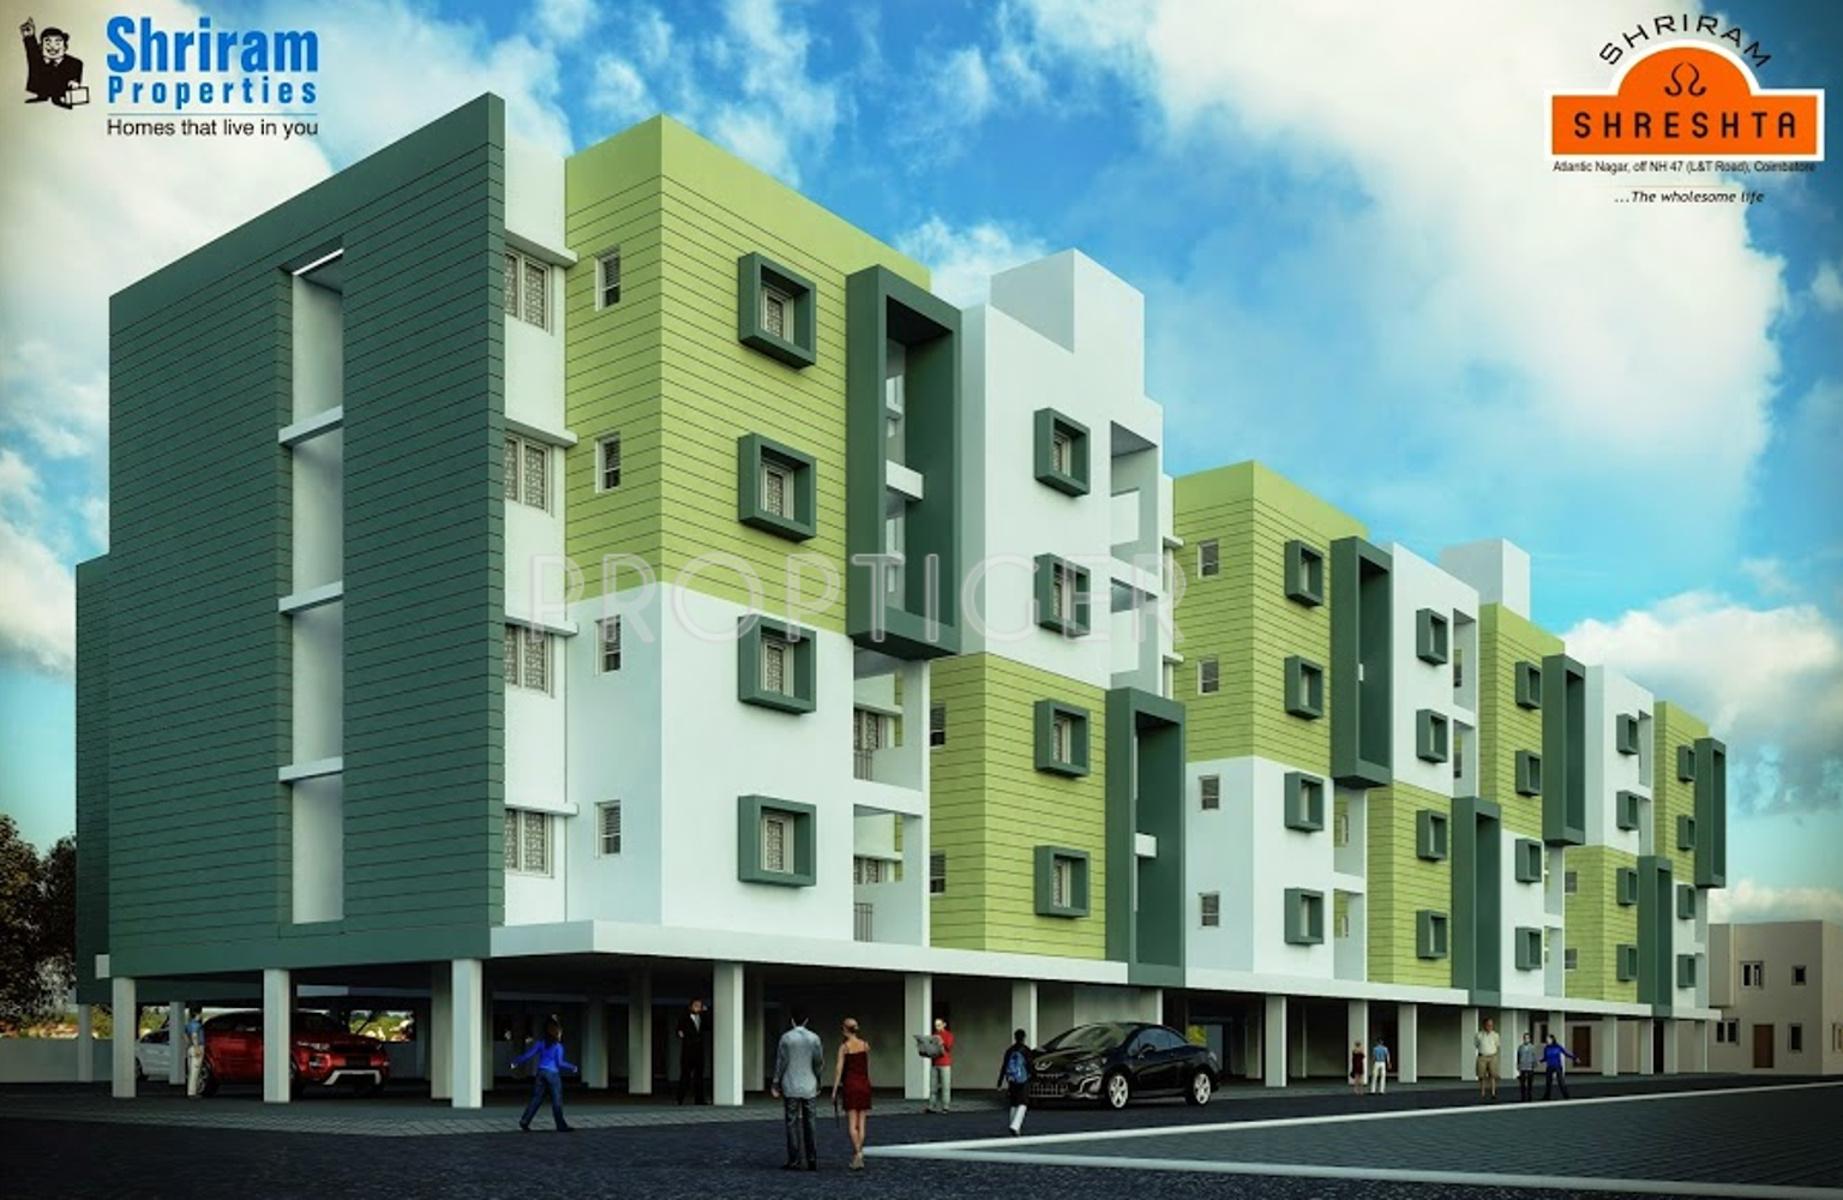 Main Elevation Image 3 Of Shriram Properties Shreshta